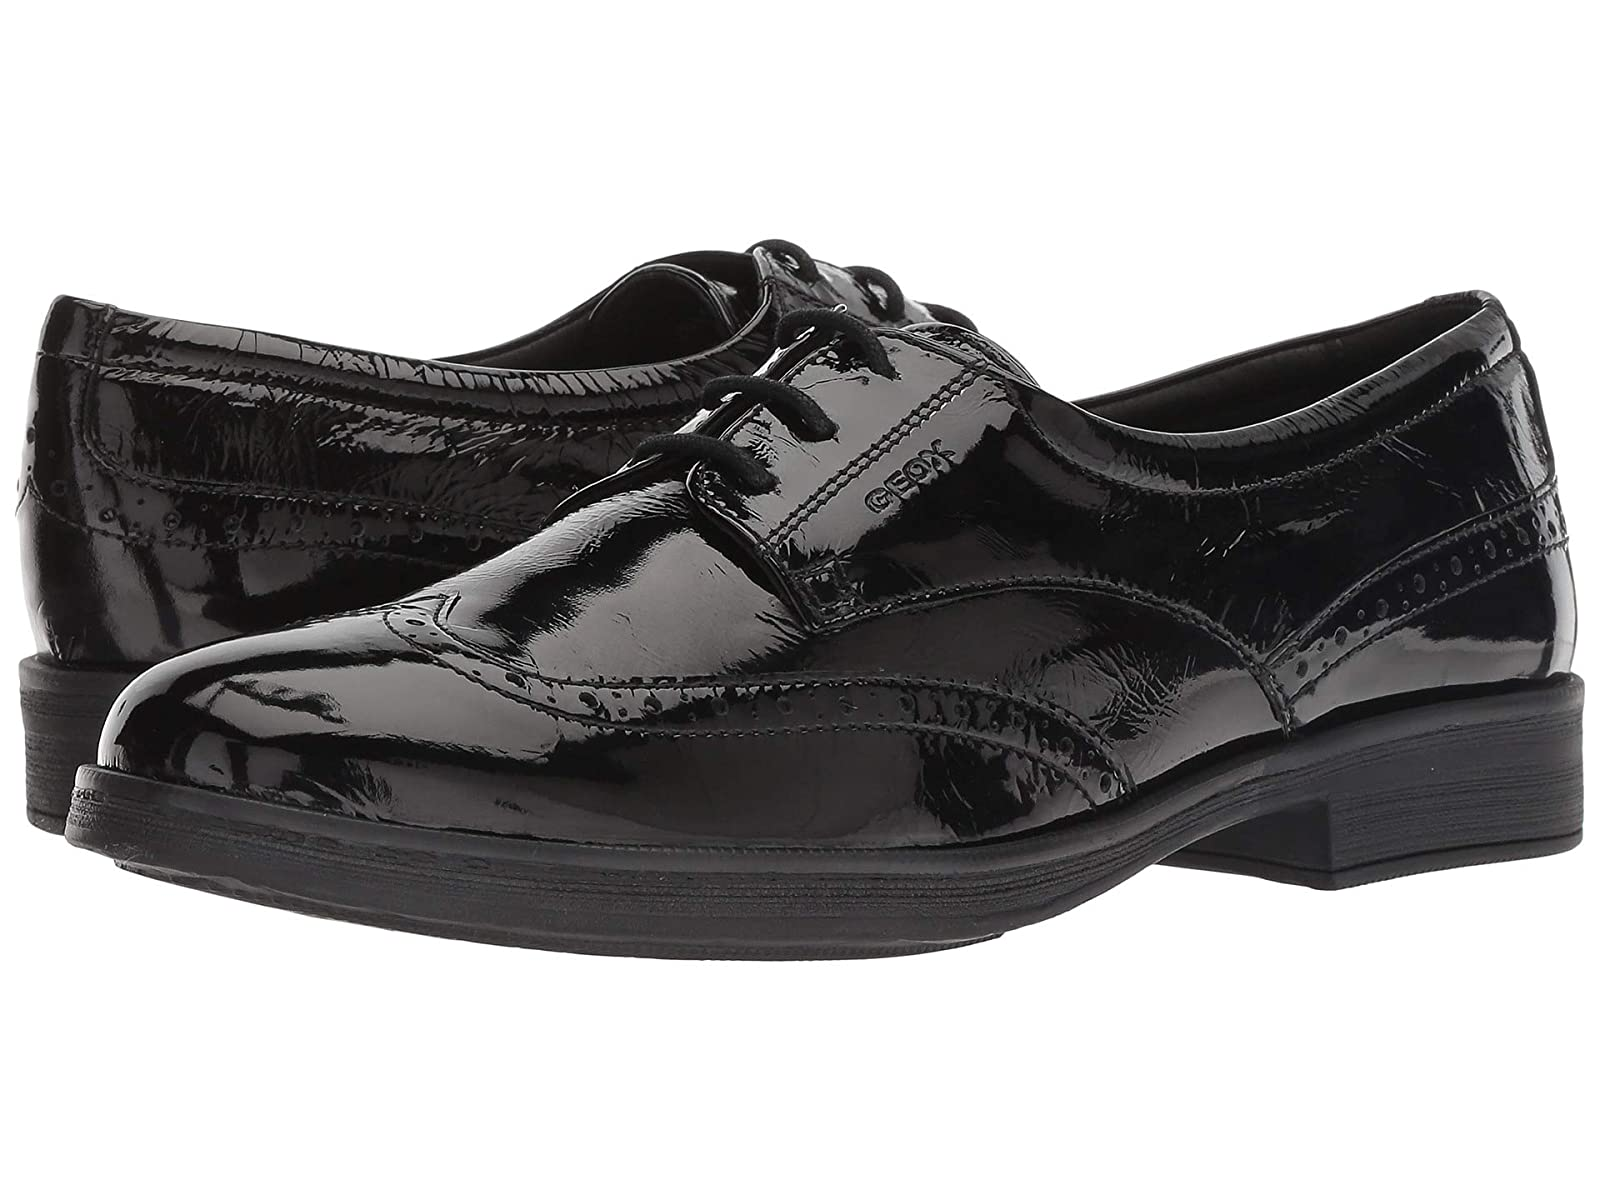 Geox Kids Agata 26 (Big Kid)Atmospheric grades have affordable shoes